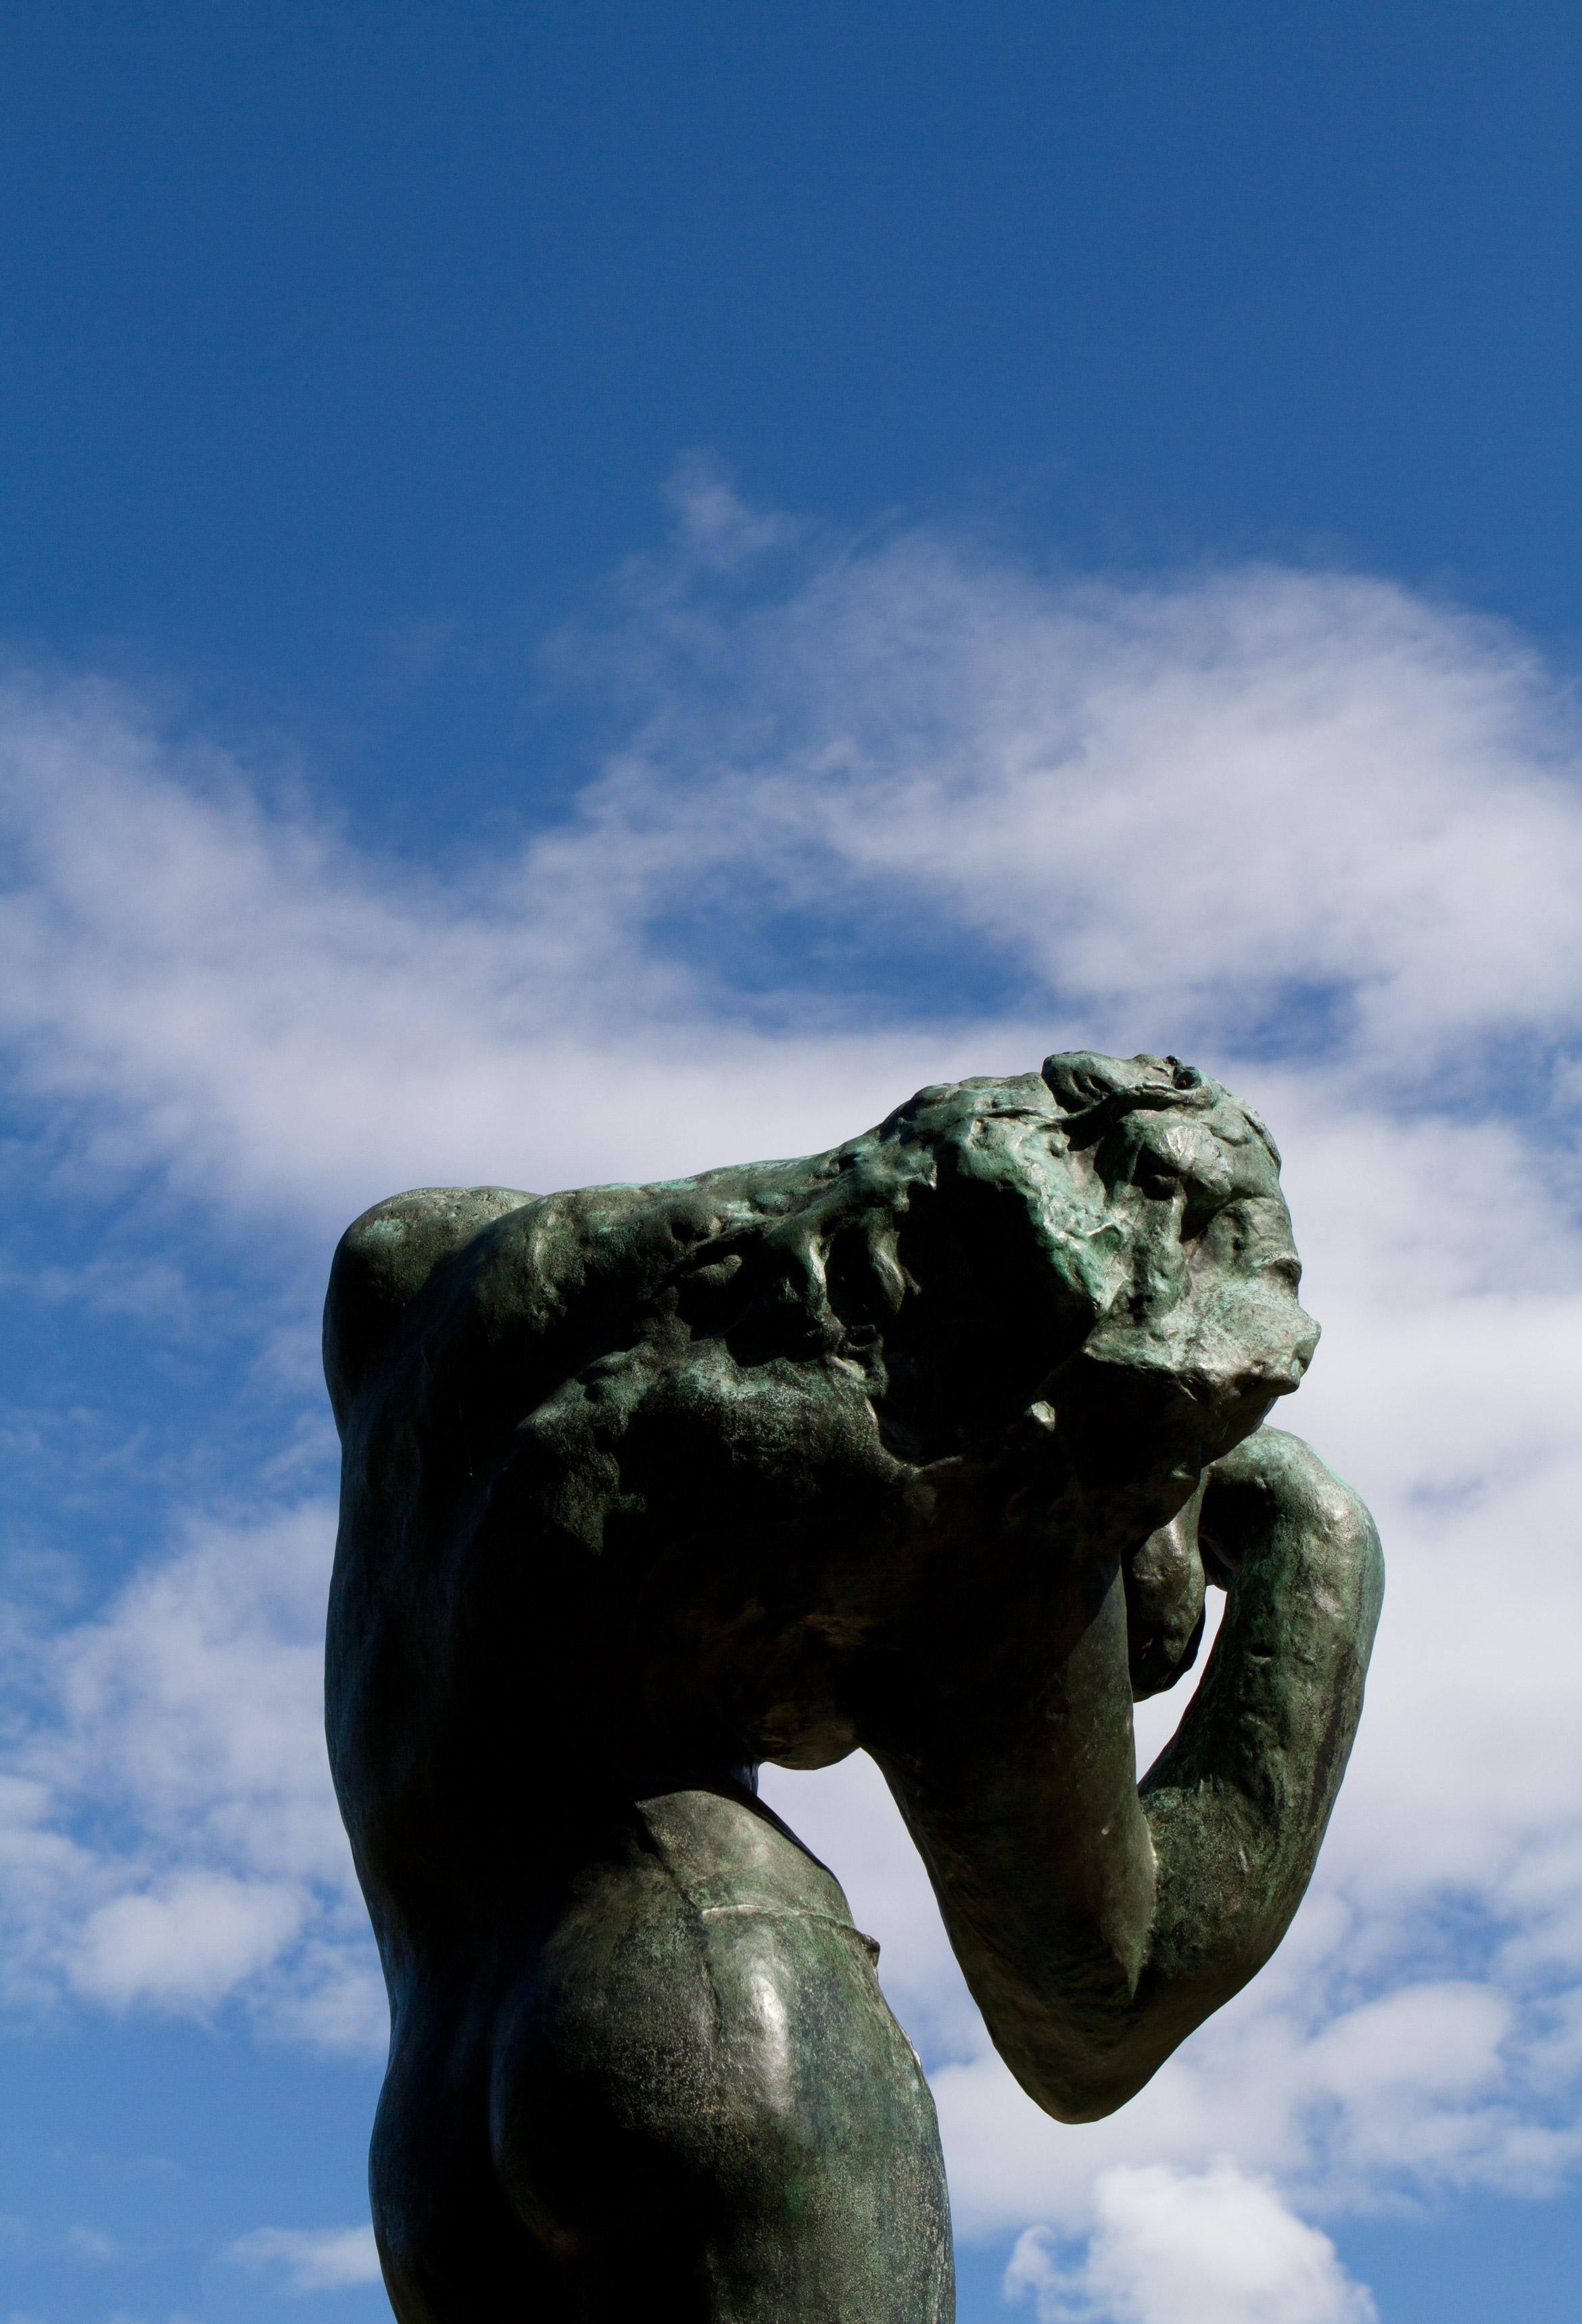 rodin-sculpture-paris